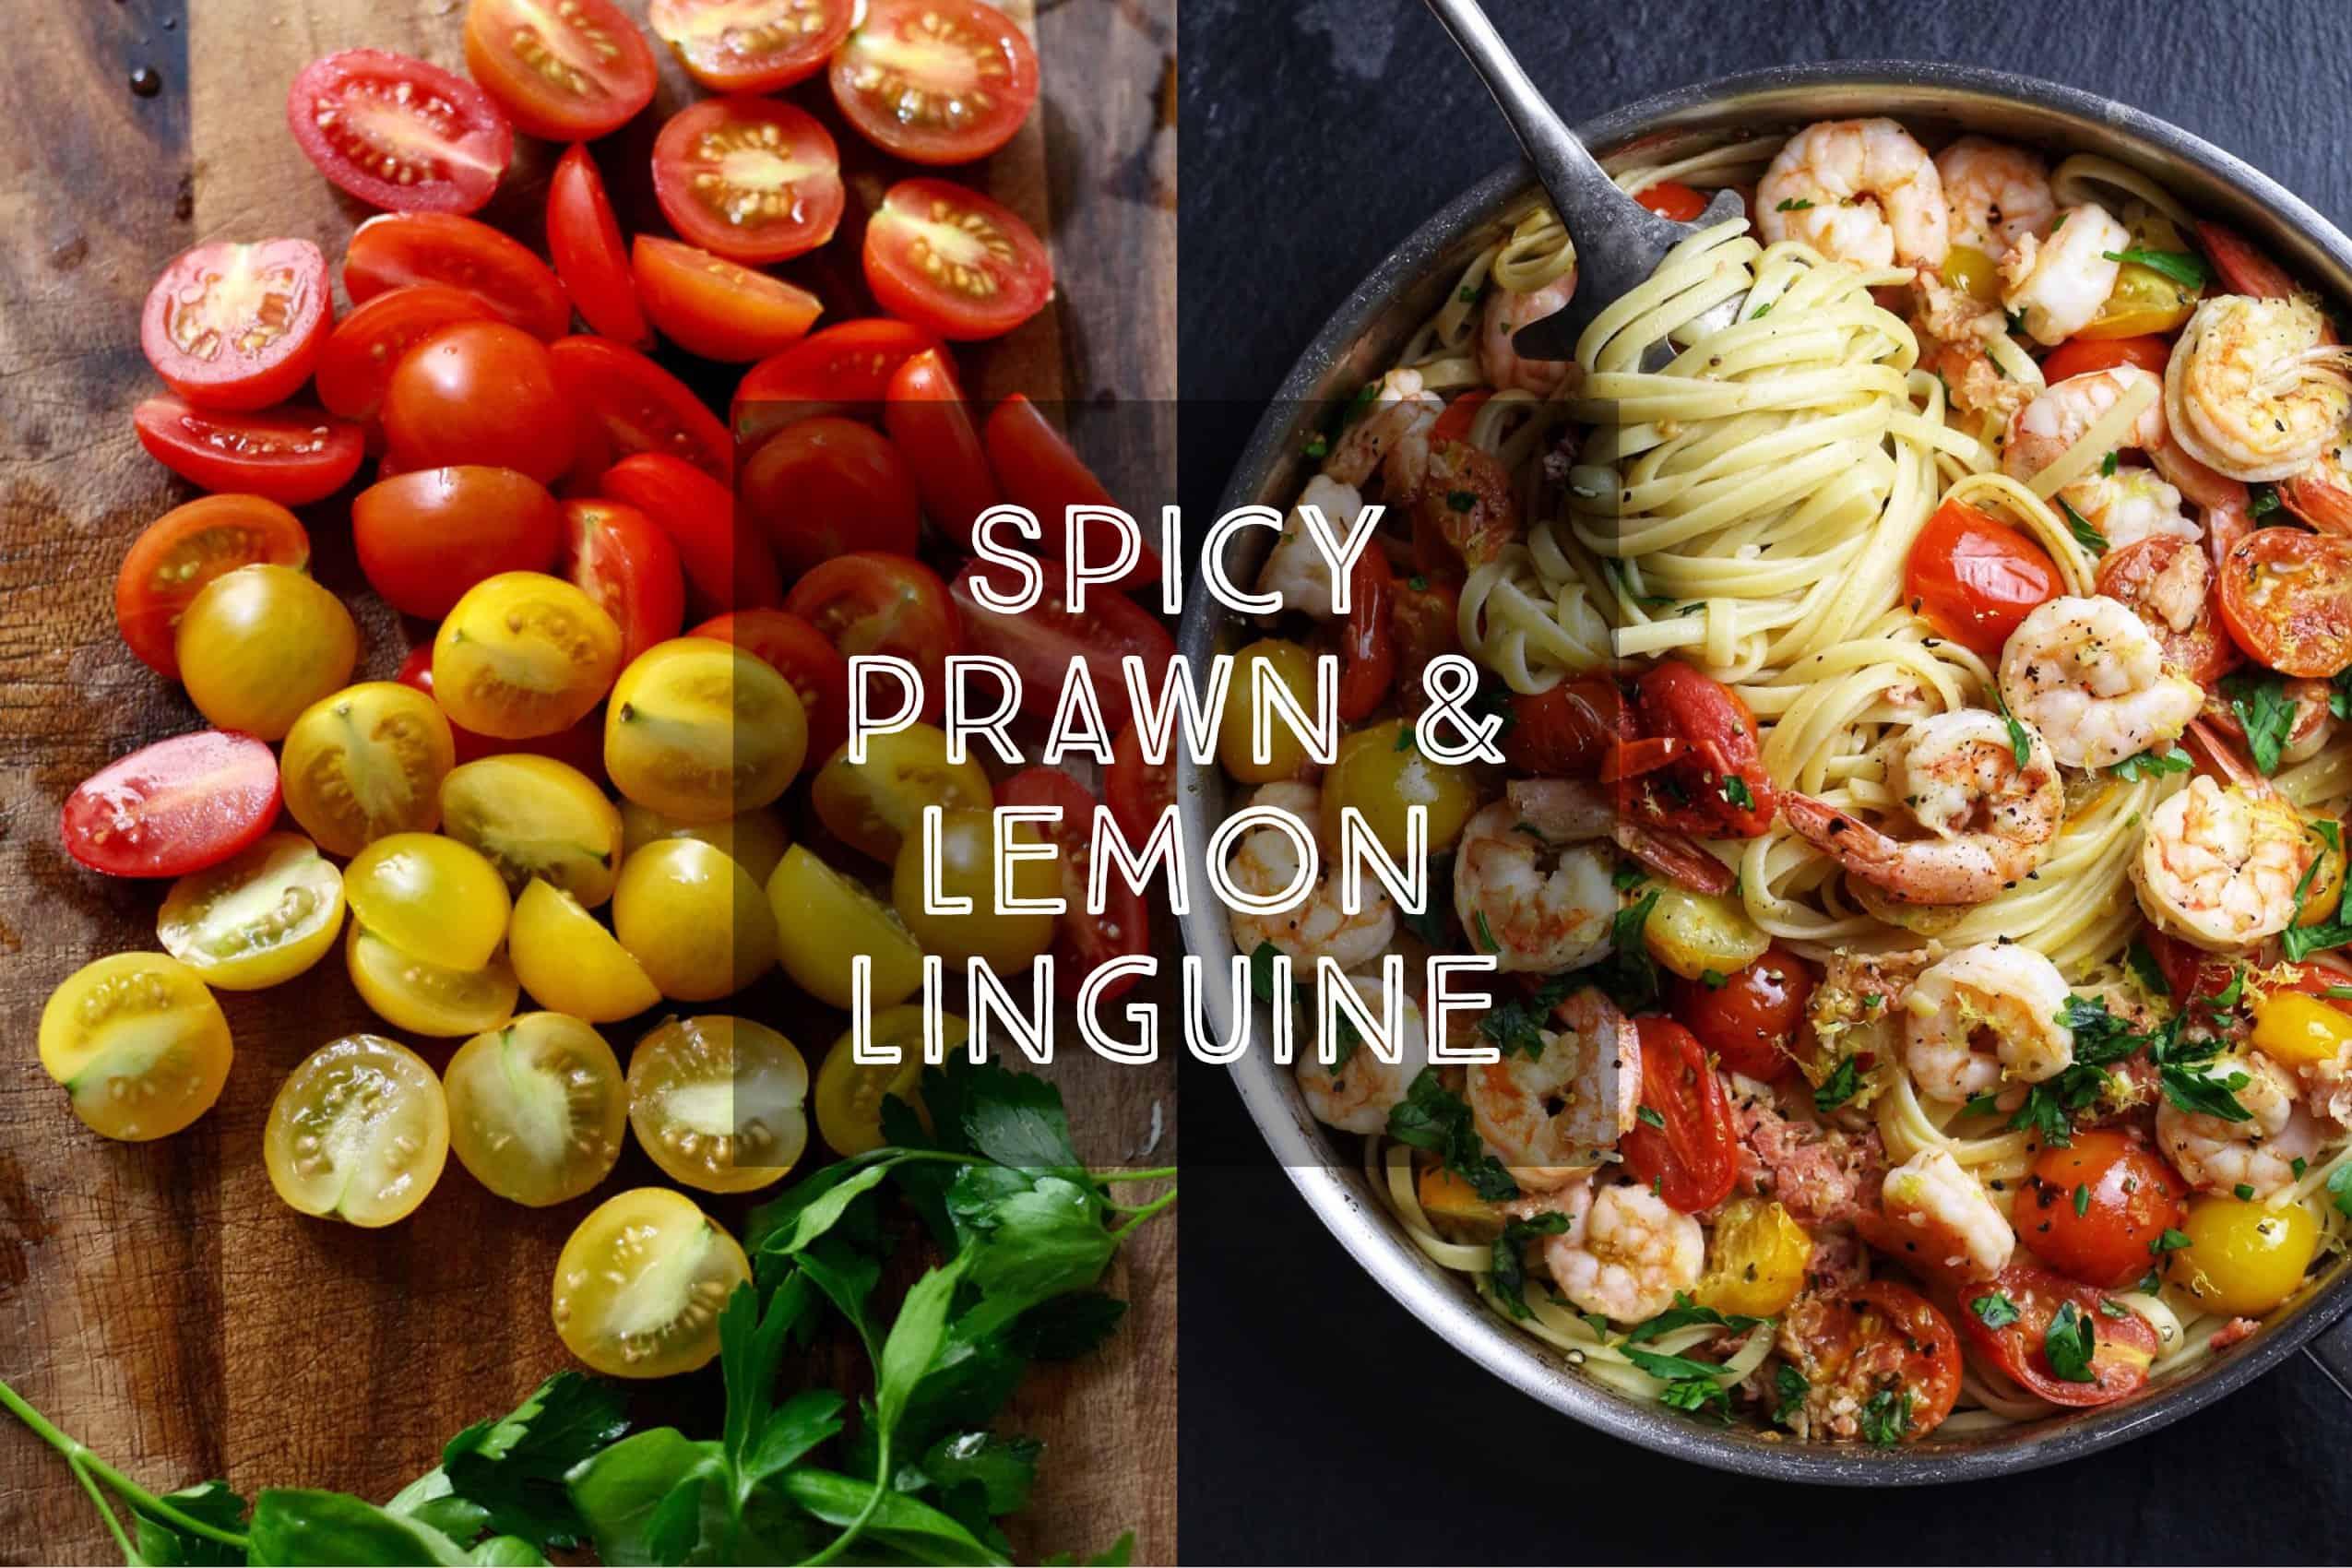 Spicy Prawn & Lemon Linguine